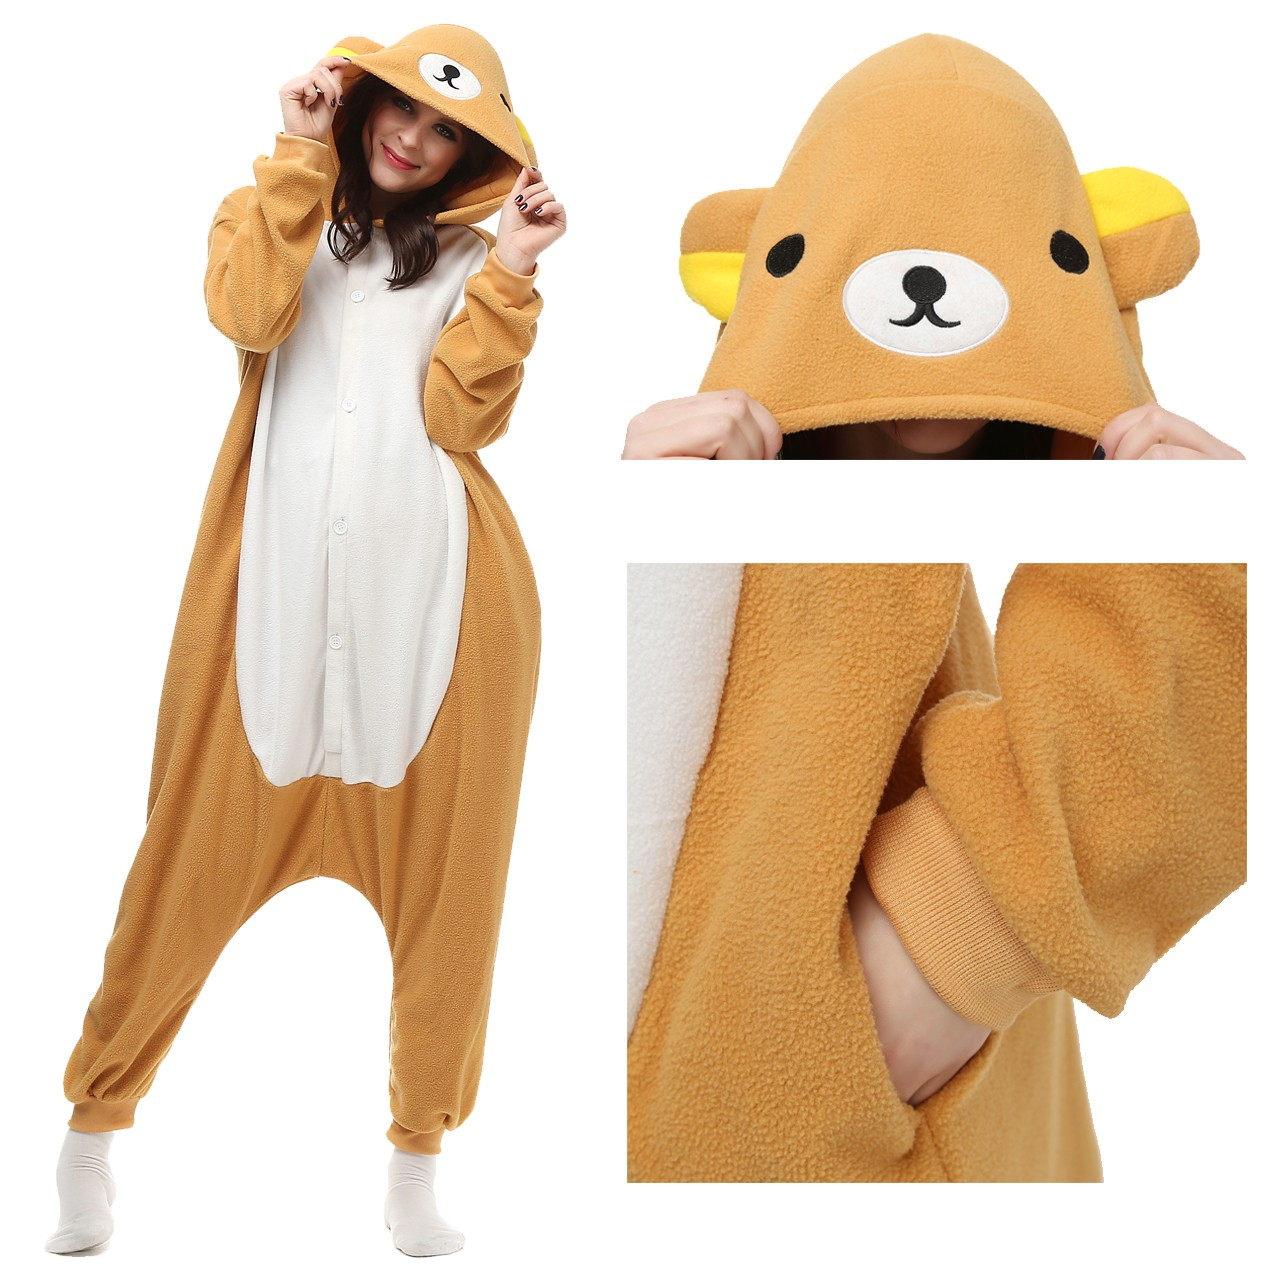 2a45186b61 Rilakkuma Onesie Unisex Women   Men Animal Pajama Kigurumi Party Costume